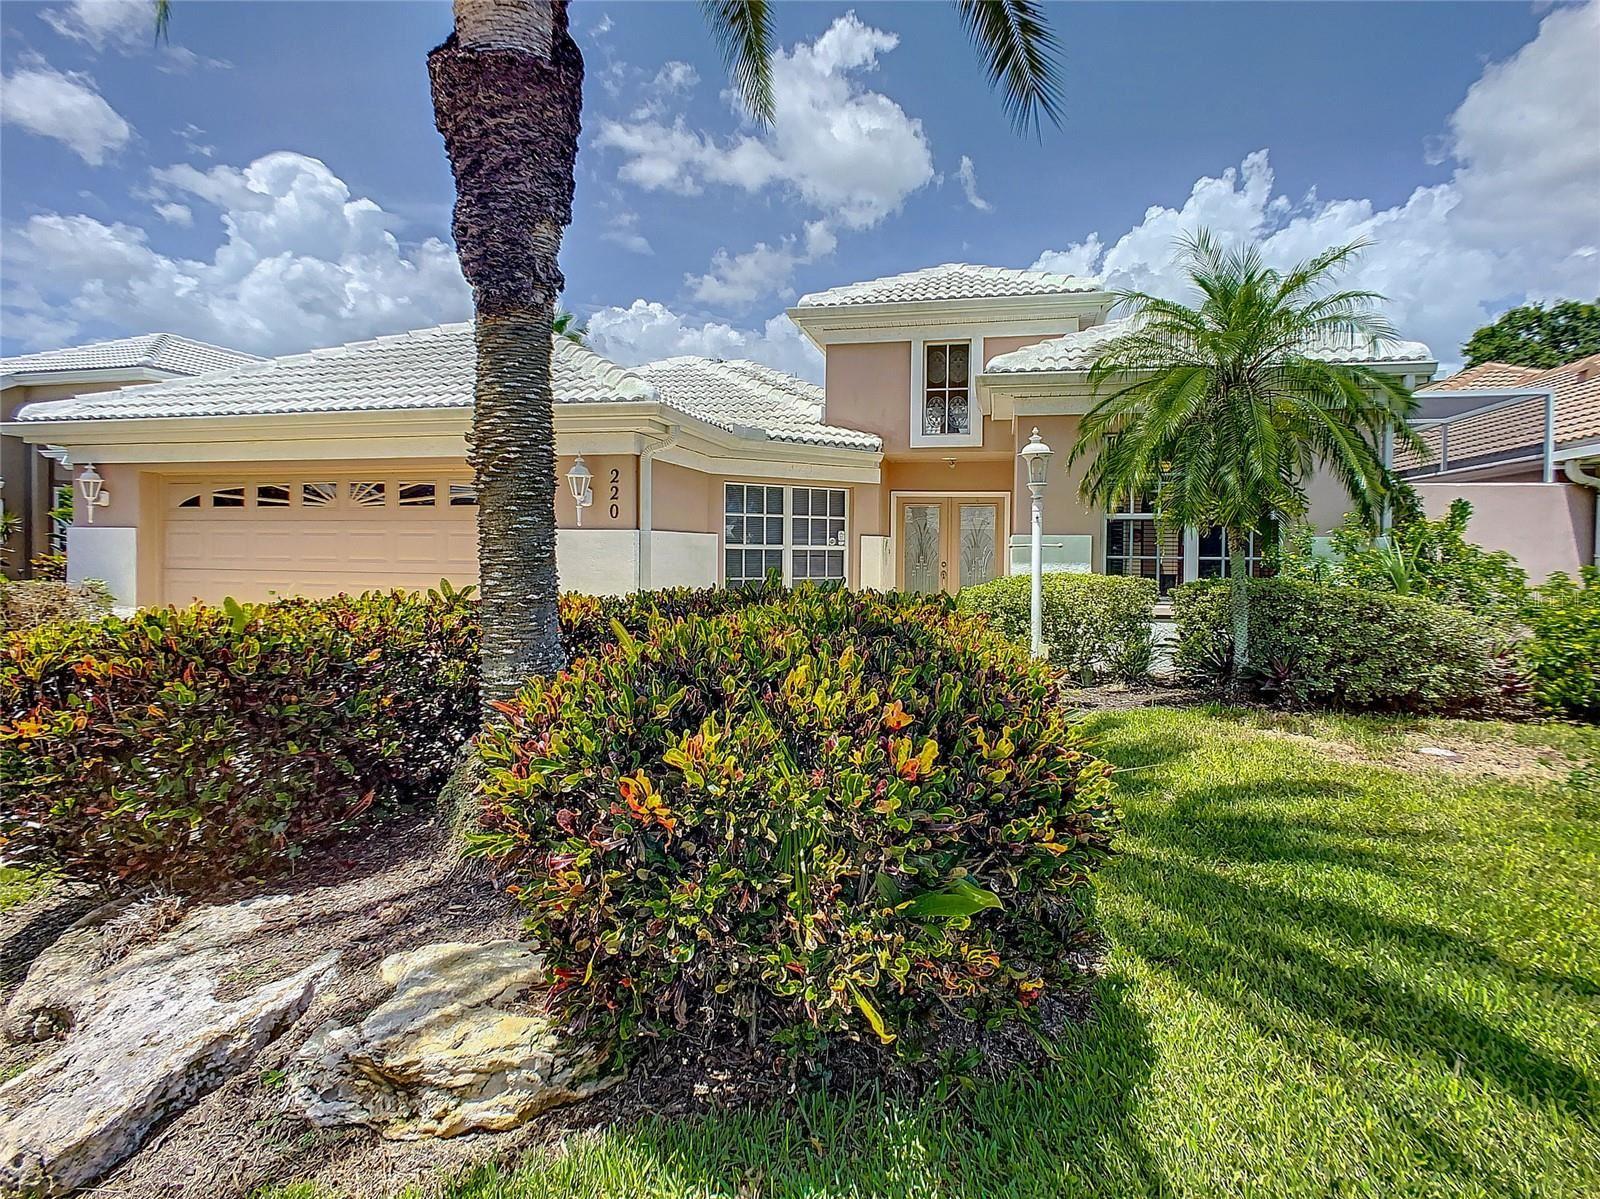 Photo of 220 VESTAVIA DRIVE, VENICE, FL 34292 (MLS # A4507192)